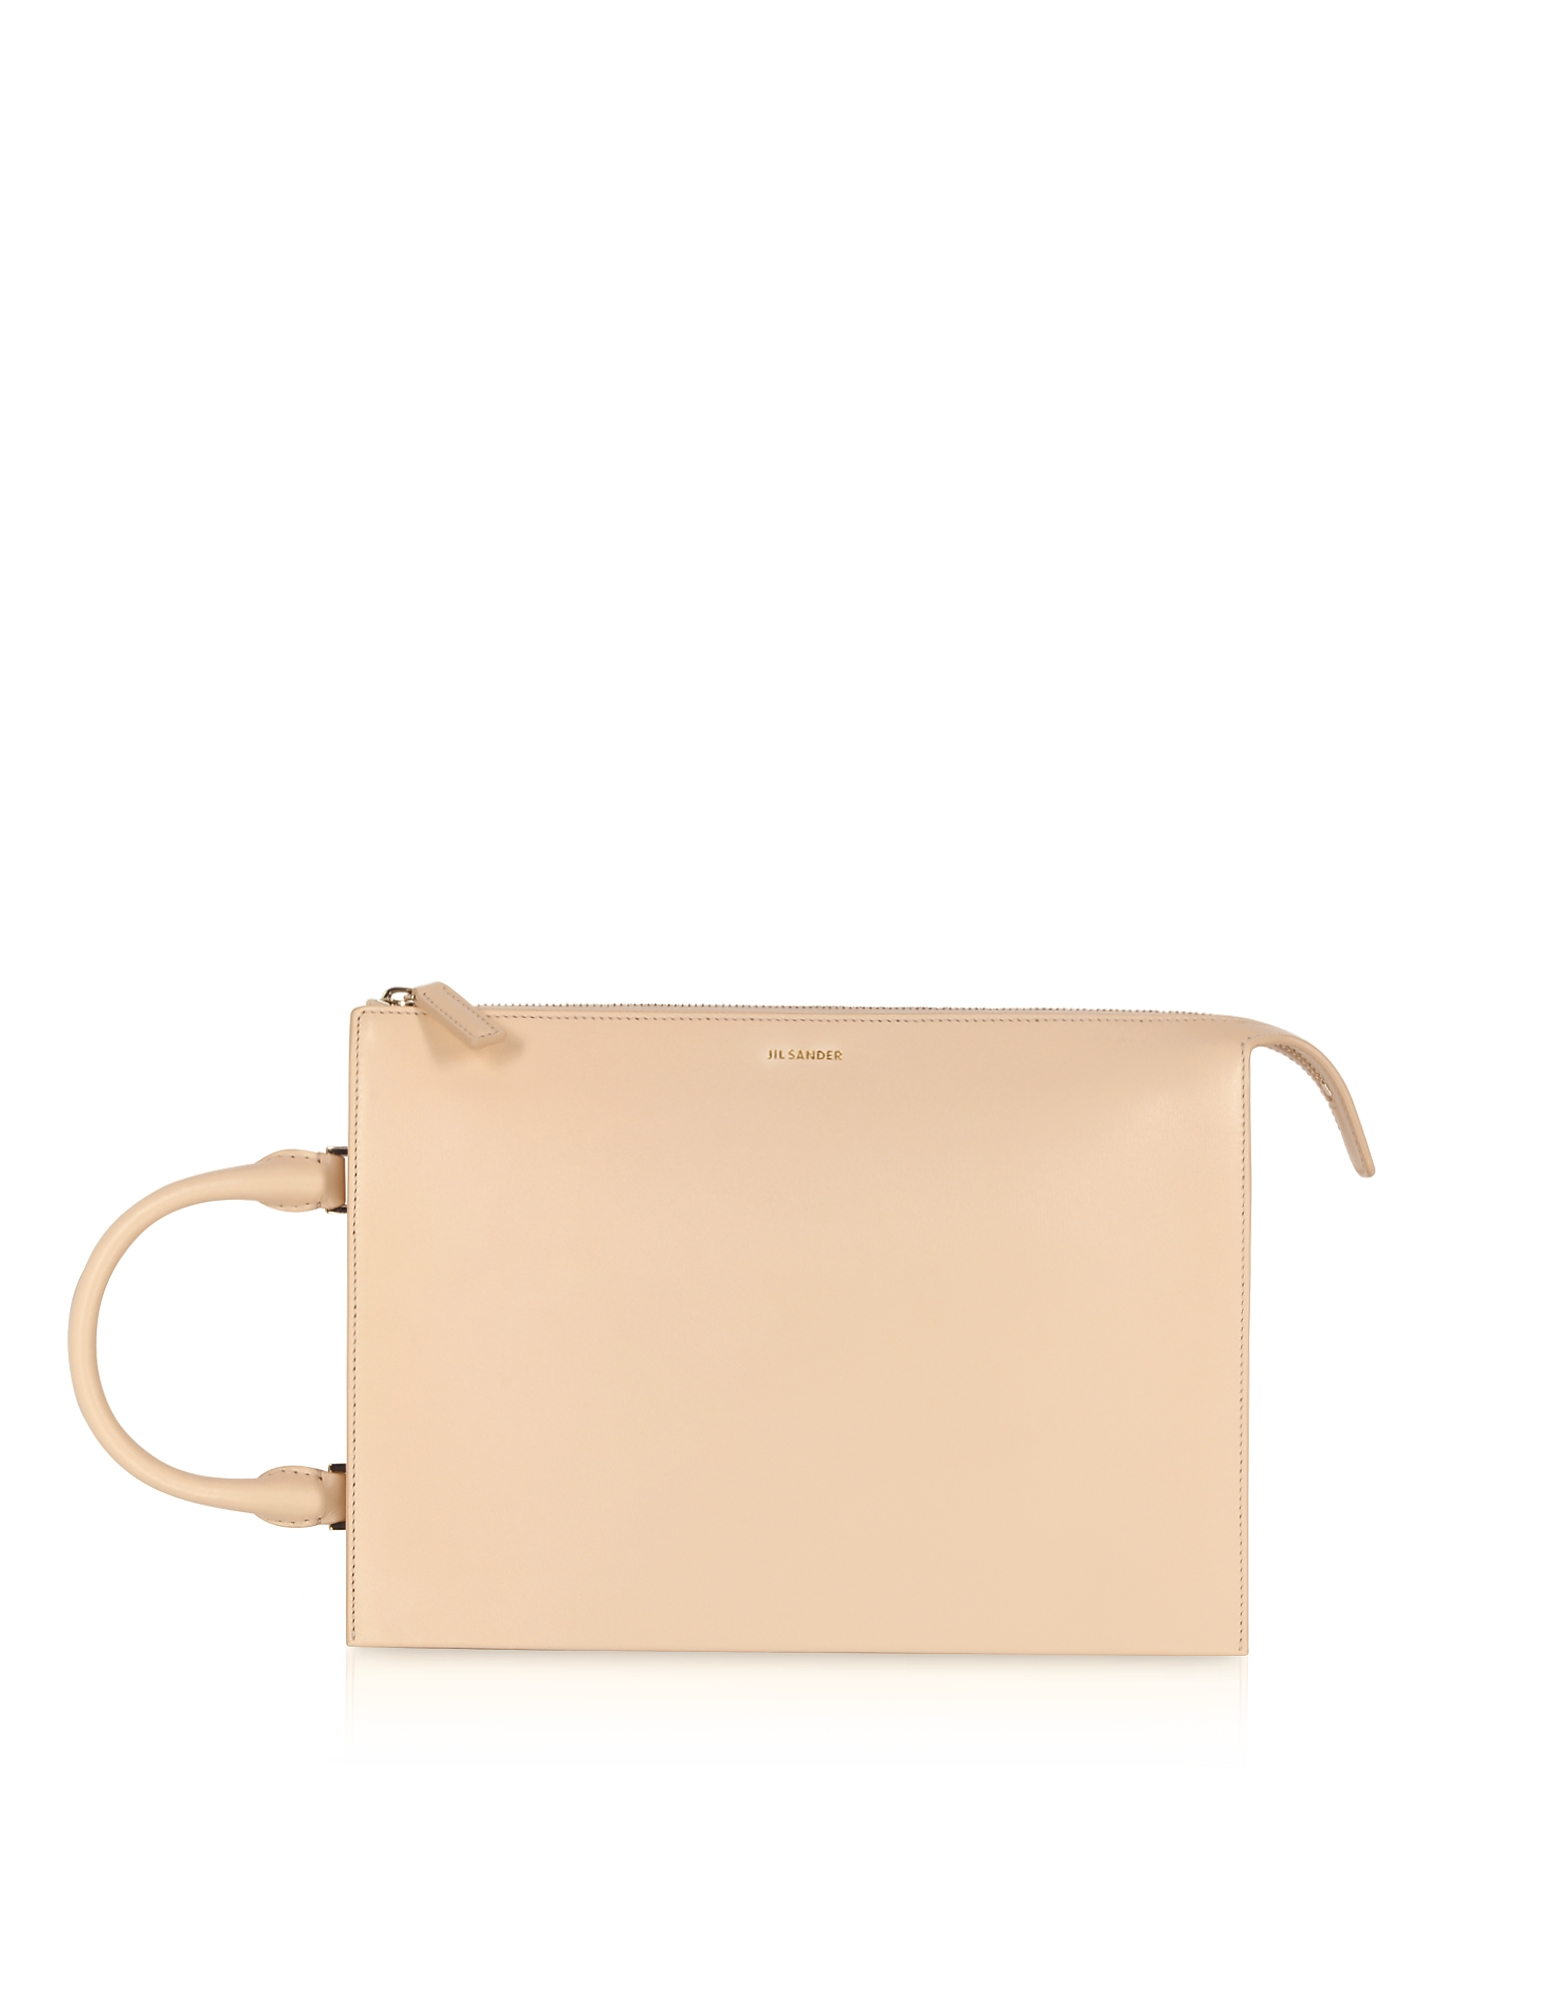 Image of Jil Sander Designer Handbags, Tootie Medium Knitted Leather Handbag